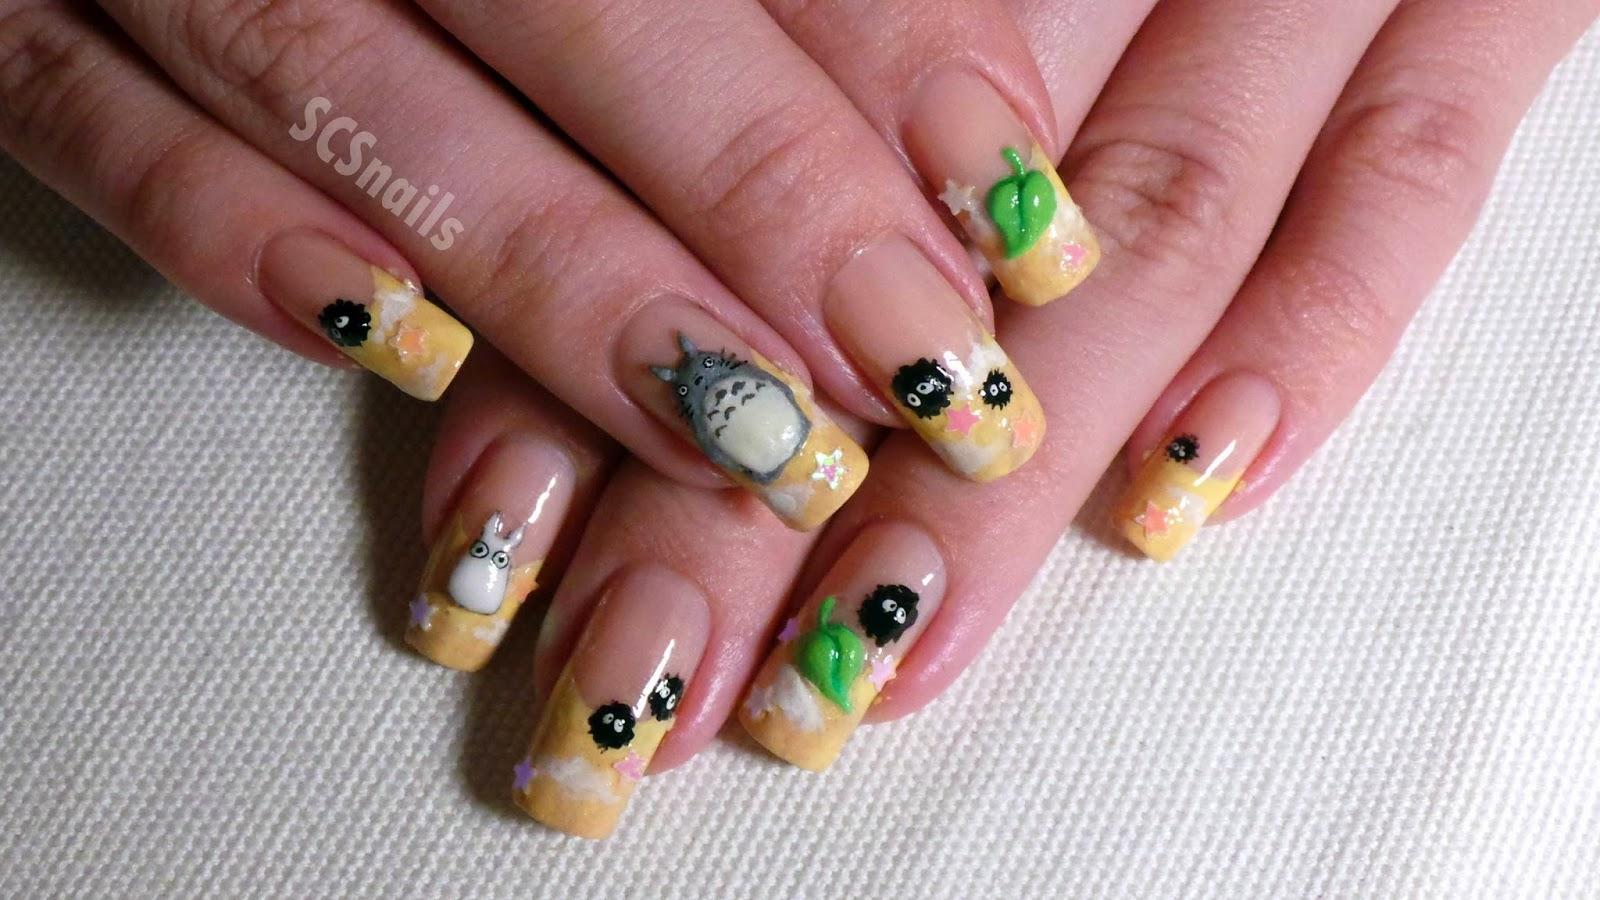 SCS nails